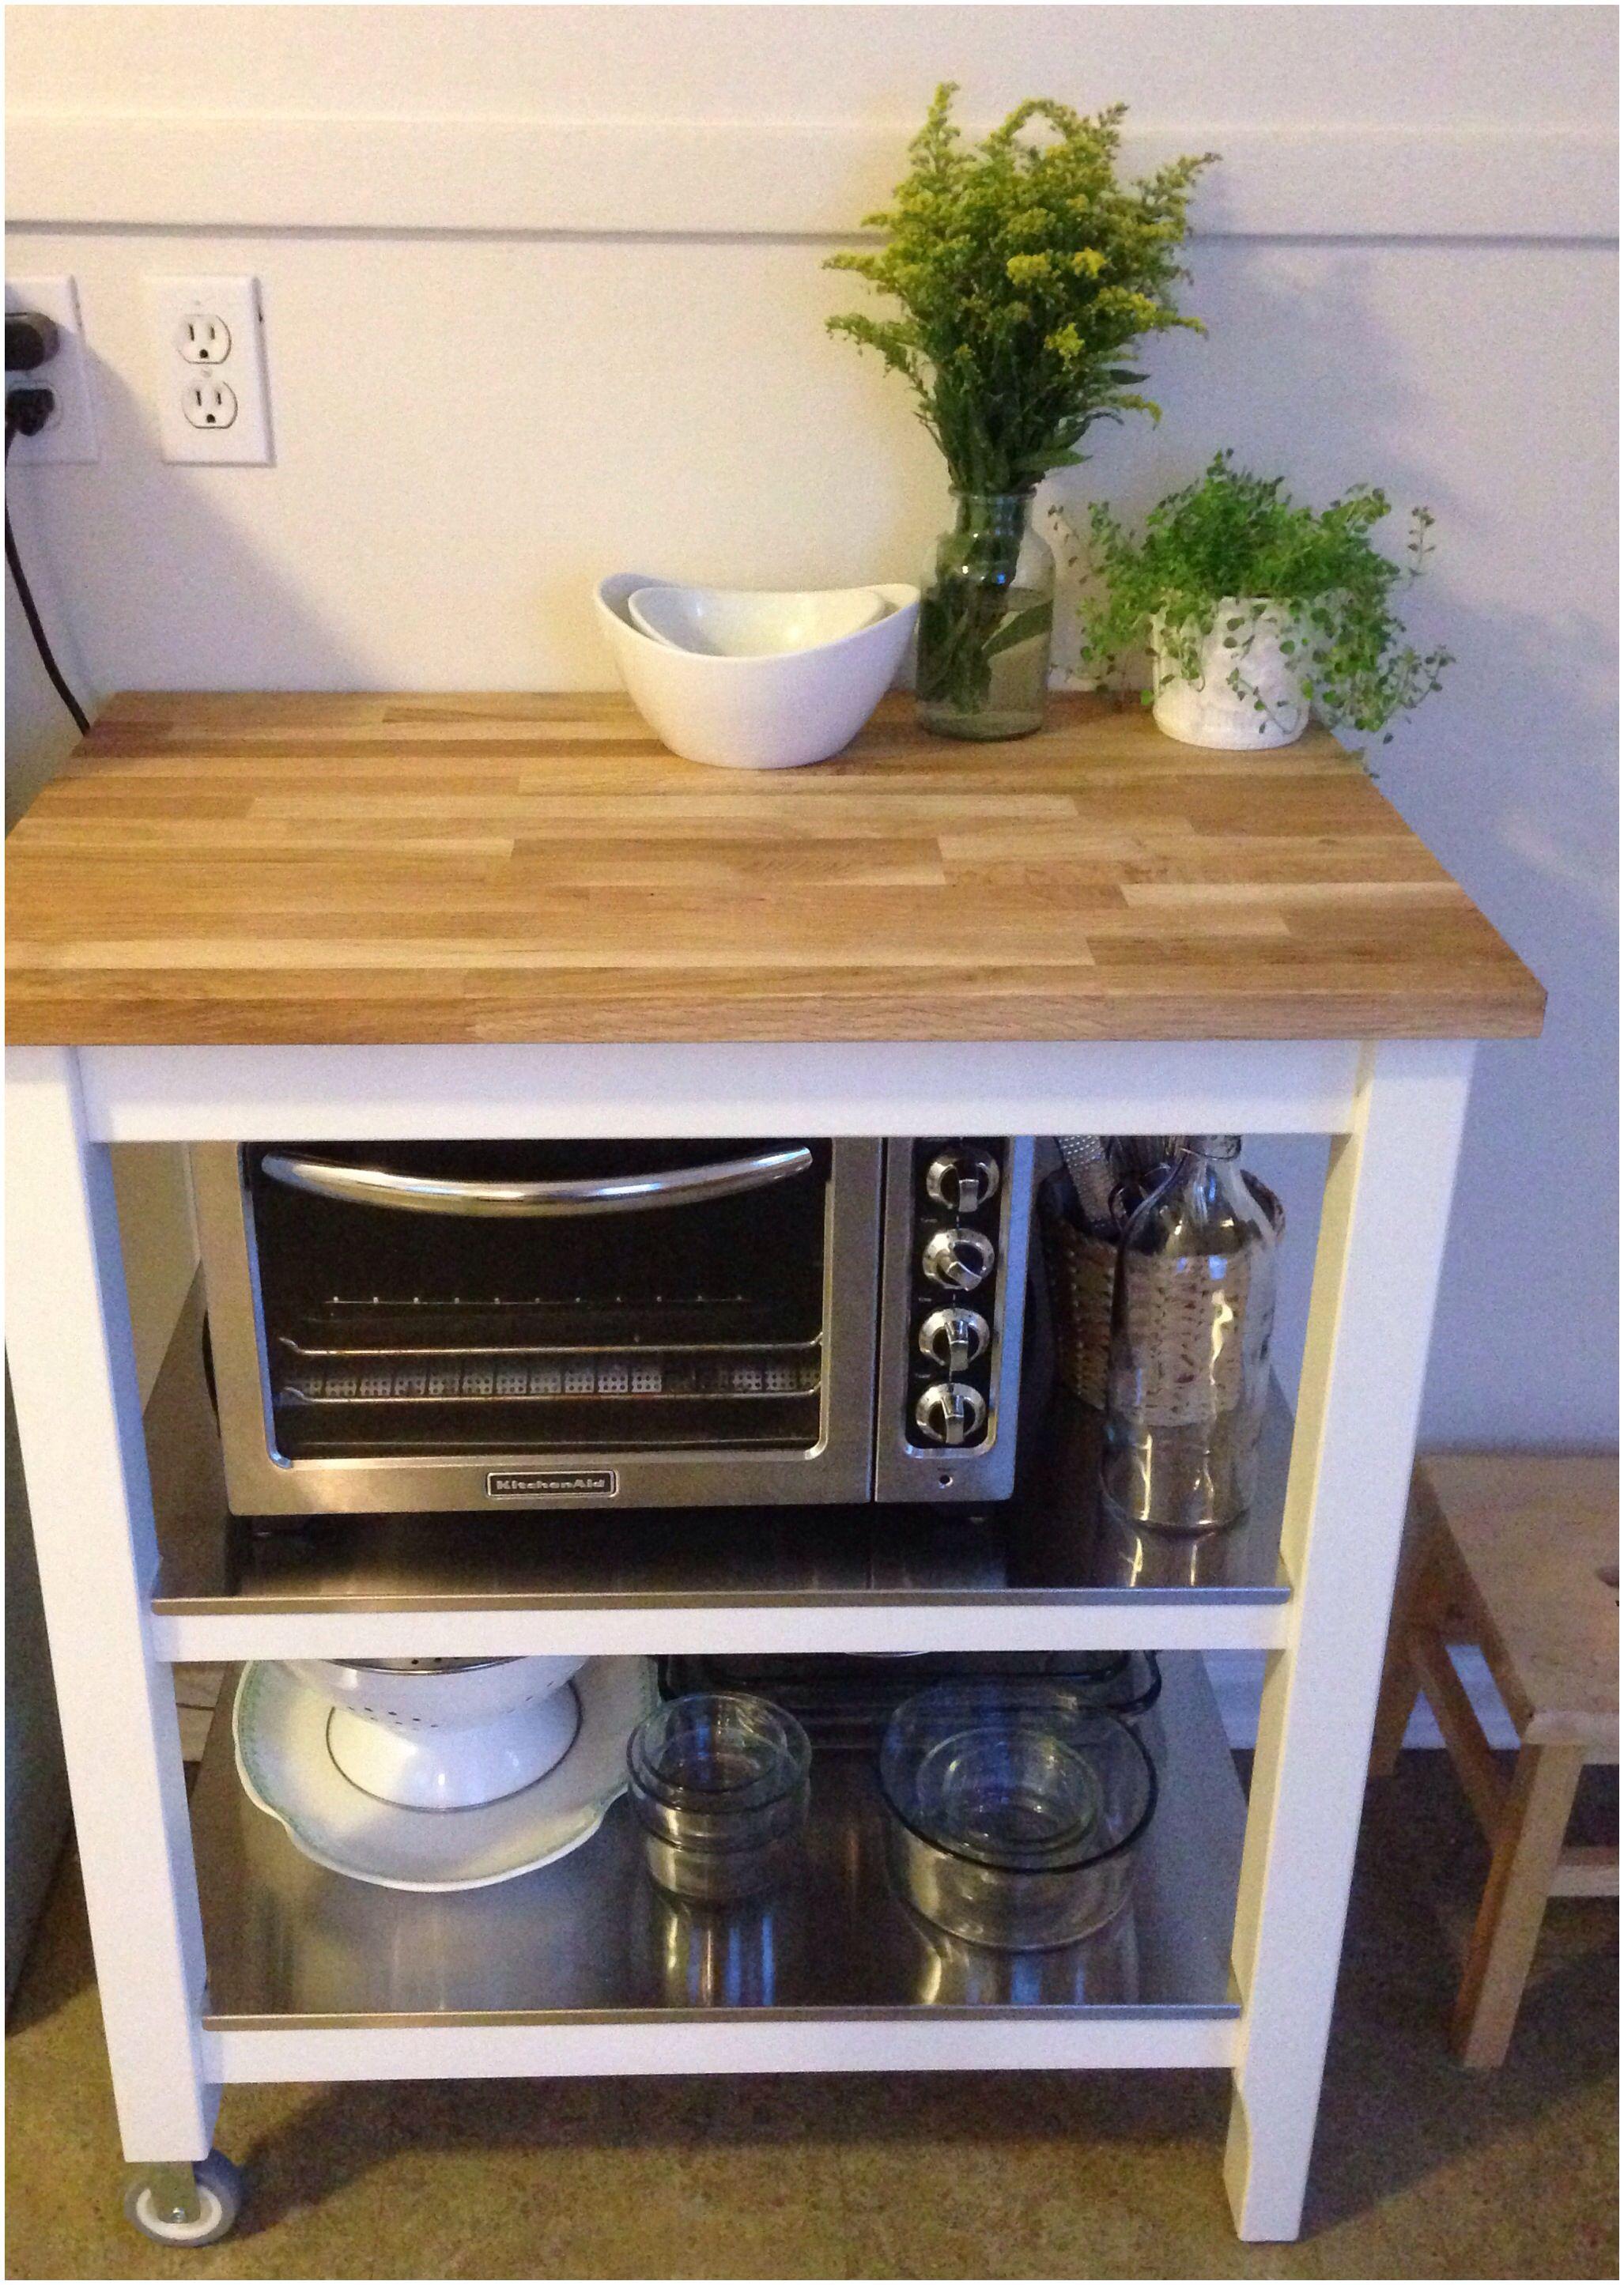 microwave kitchen carts